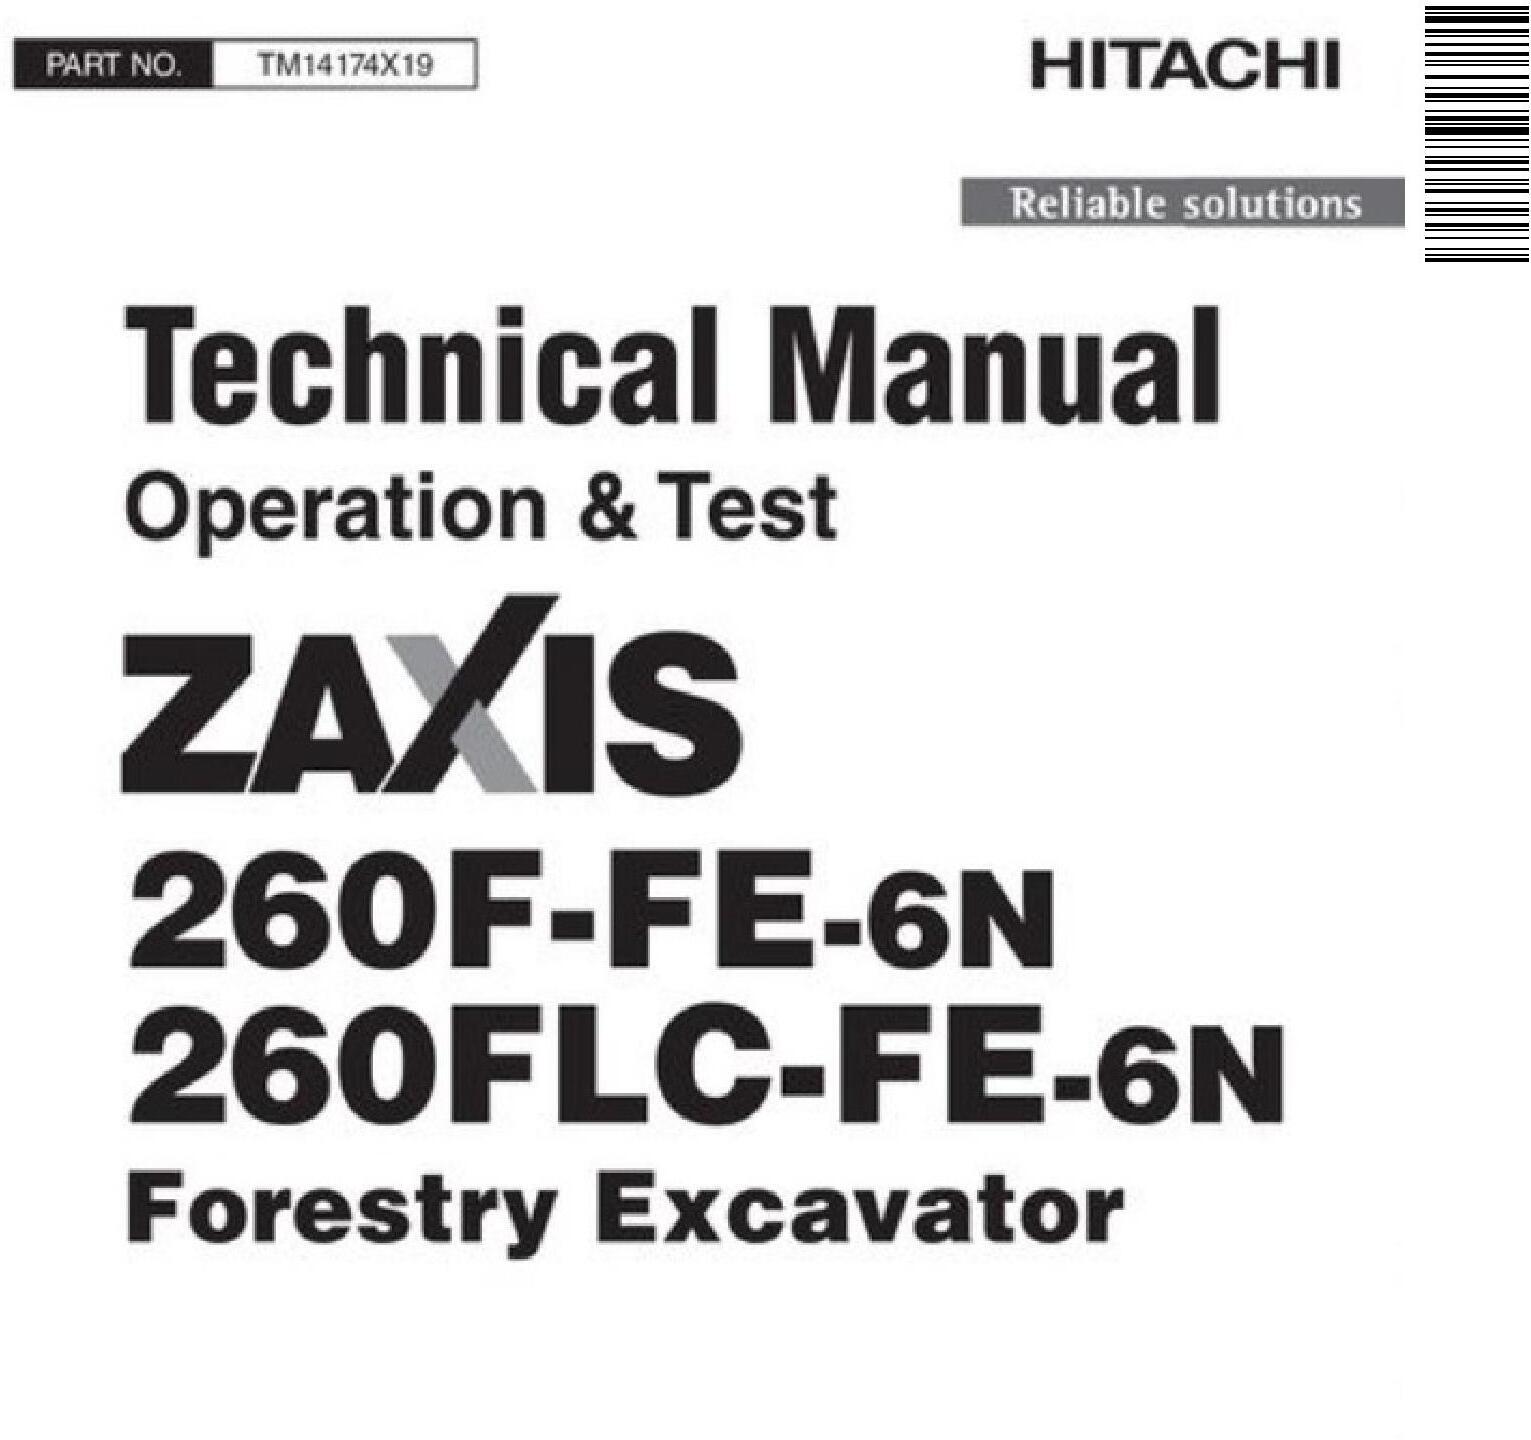 Hitachi Zaxis 260F-FE-6N, 260FLC-FE-6N Forestry Excavator